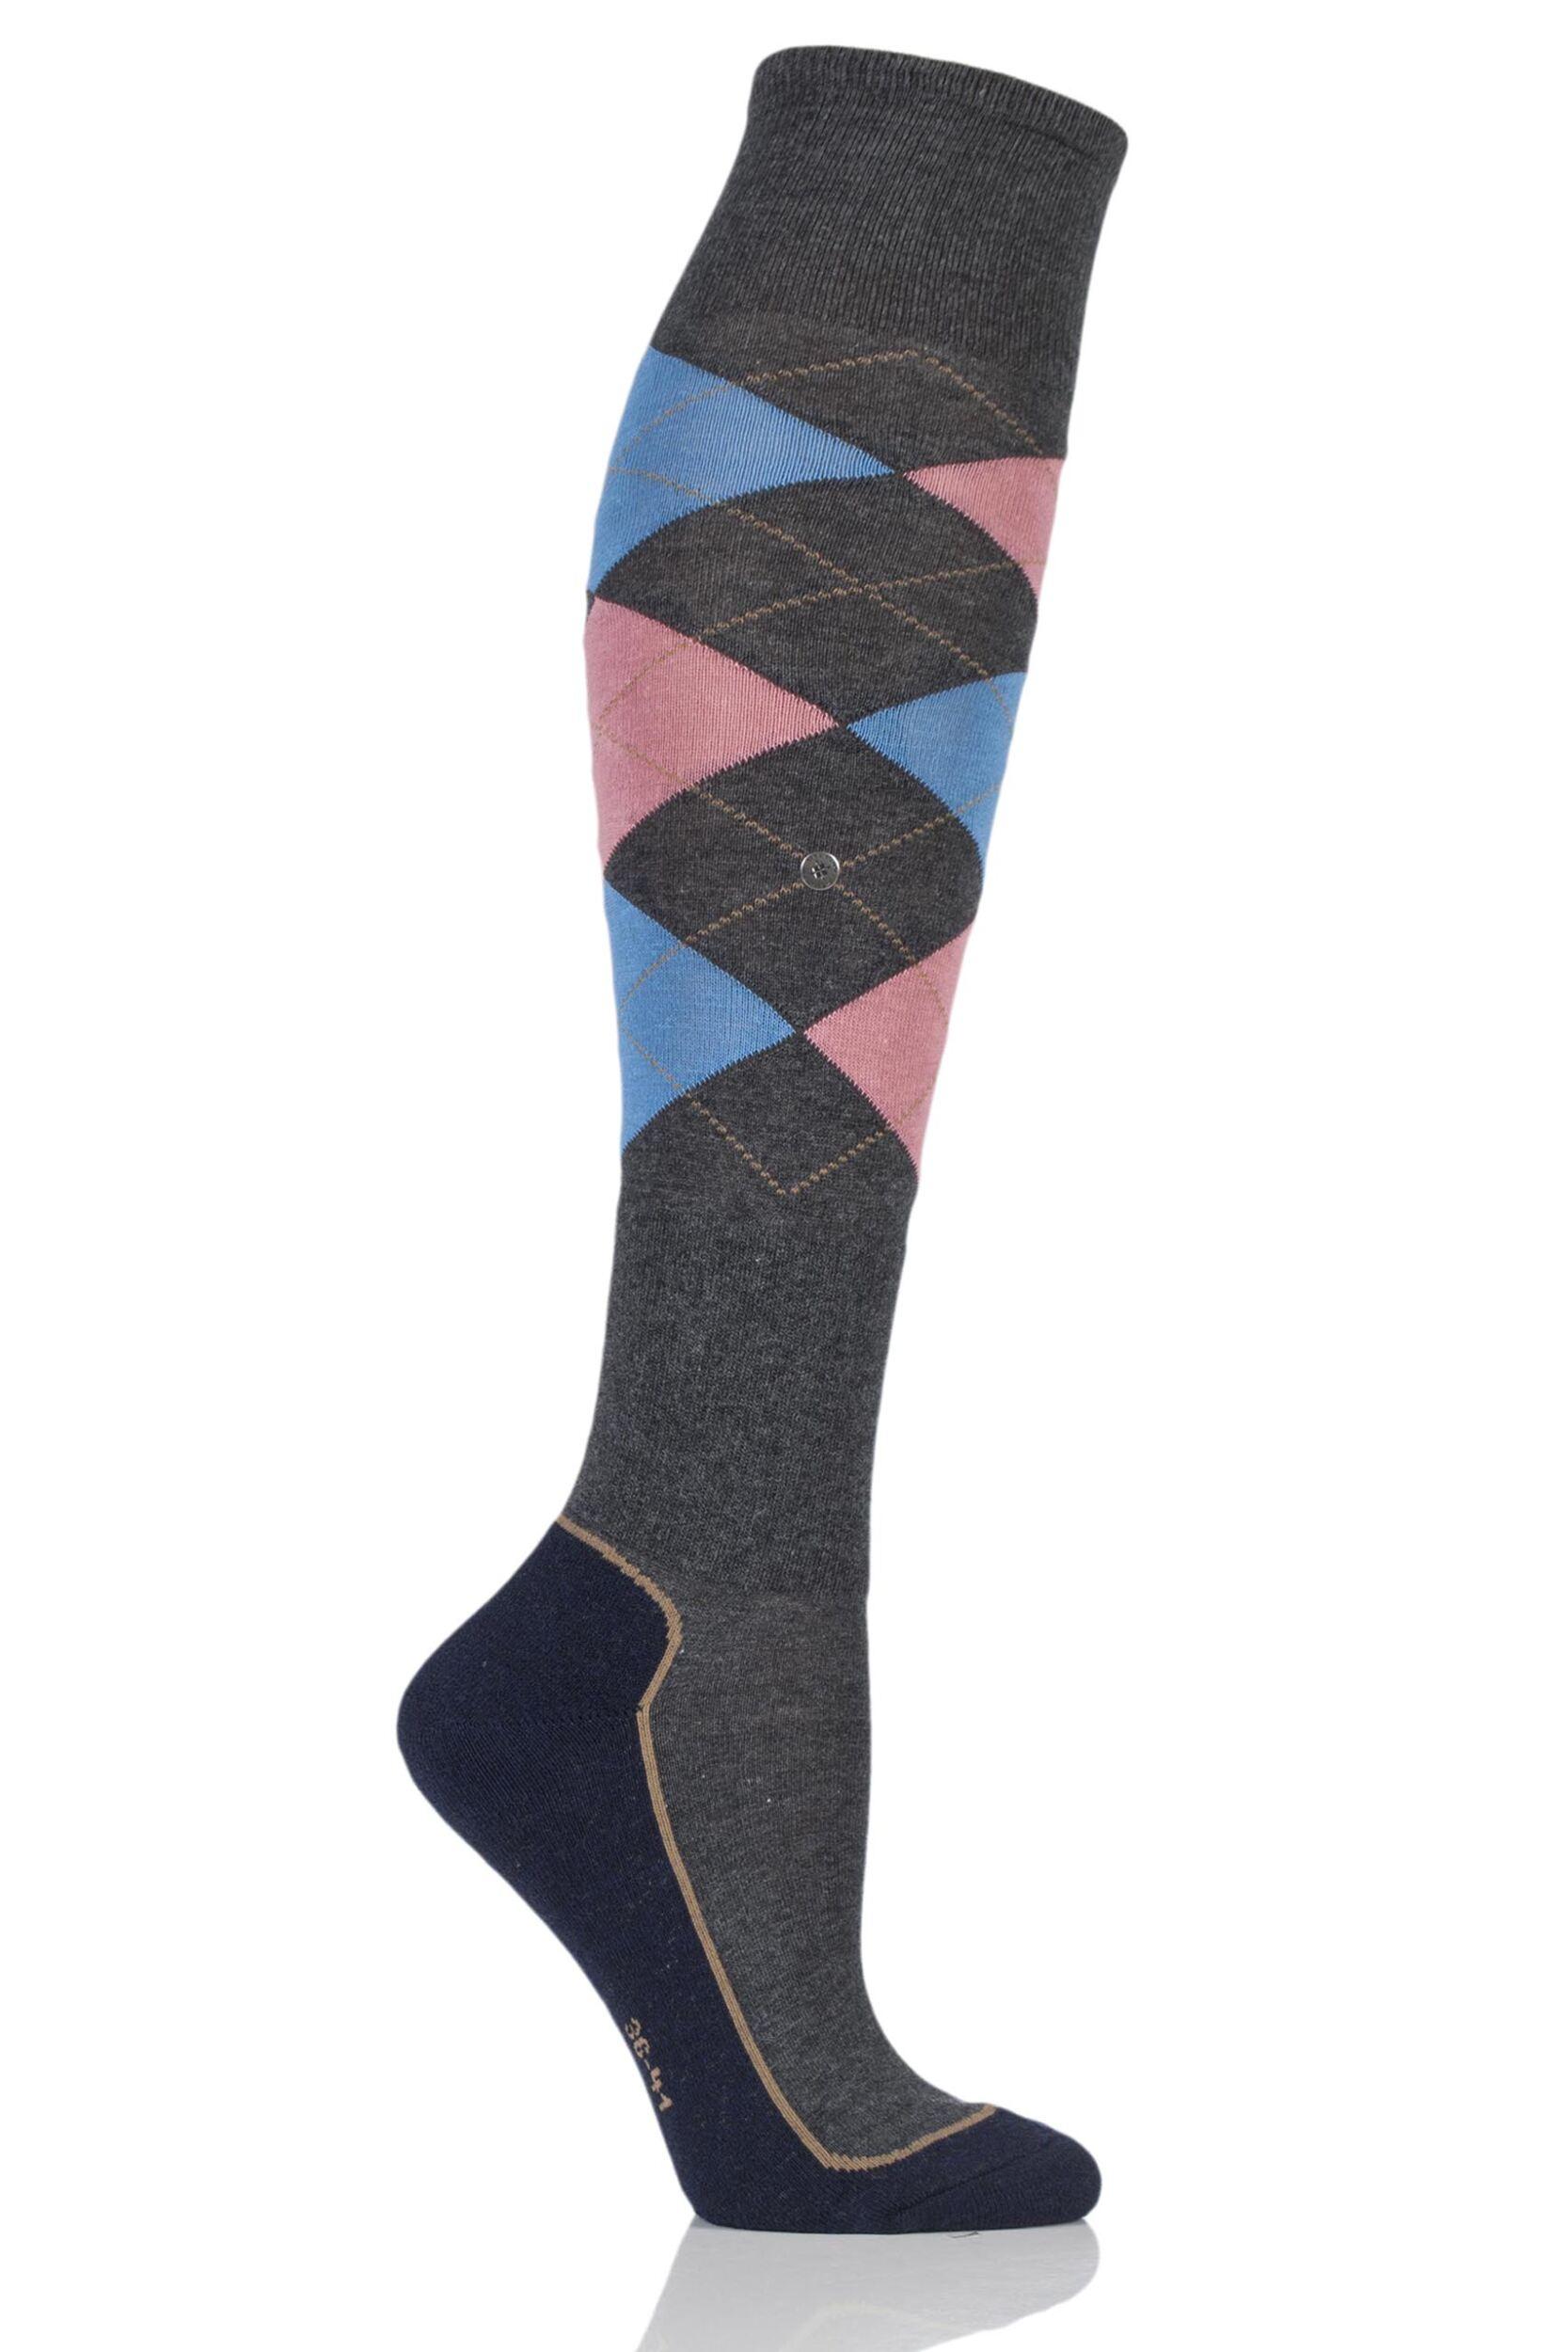 Ladies 1 Pair Burlington Shetland Knee High Riding Socks